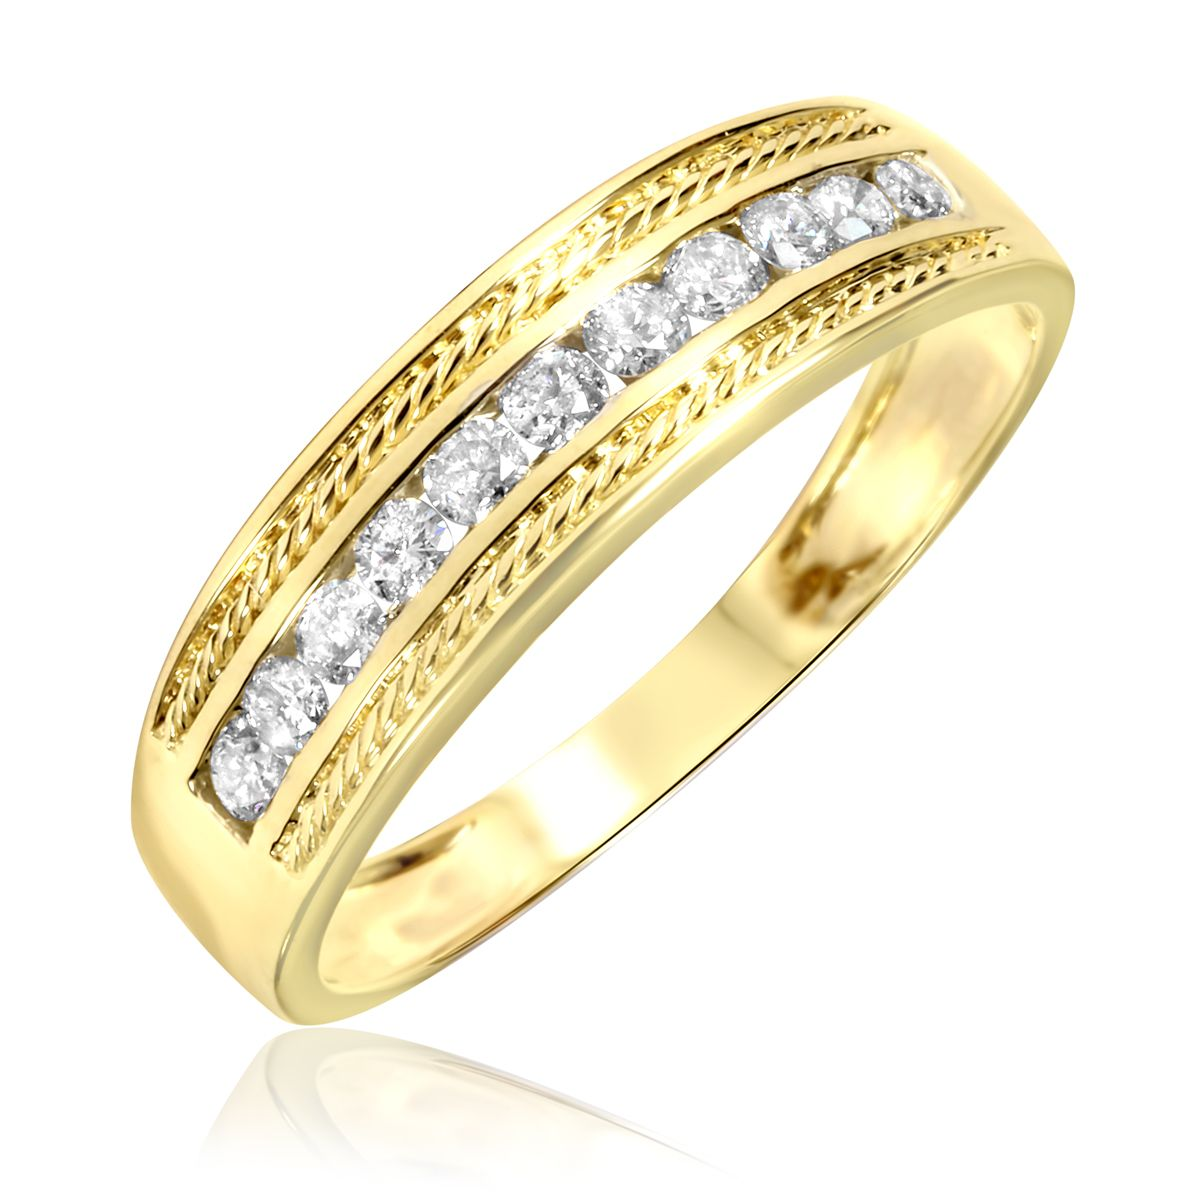 1/3 Carat T.W. Diamond Men's Wedding Ring 14K Yellow Gold